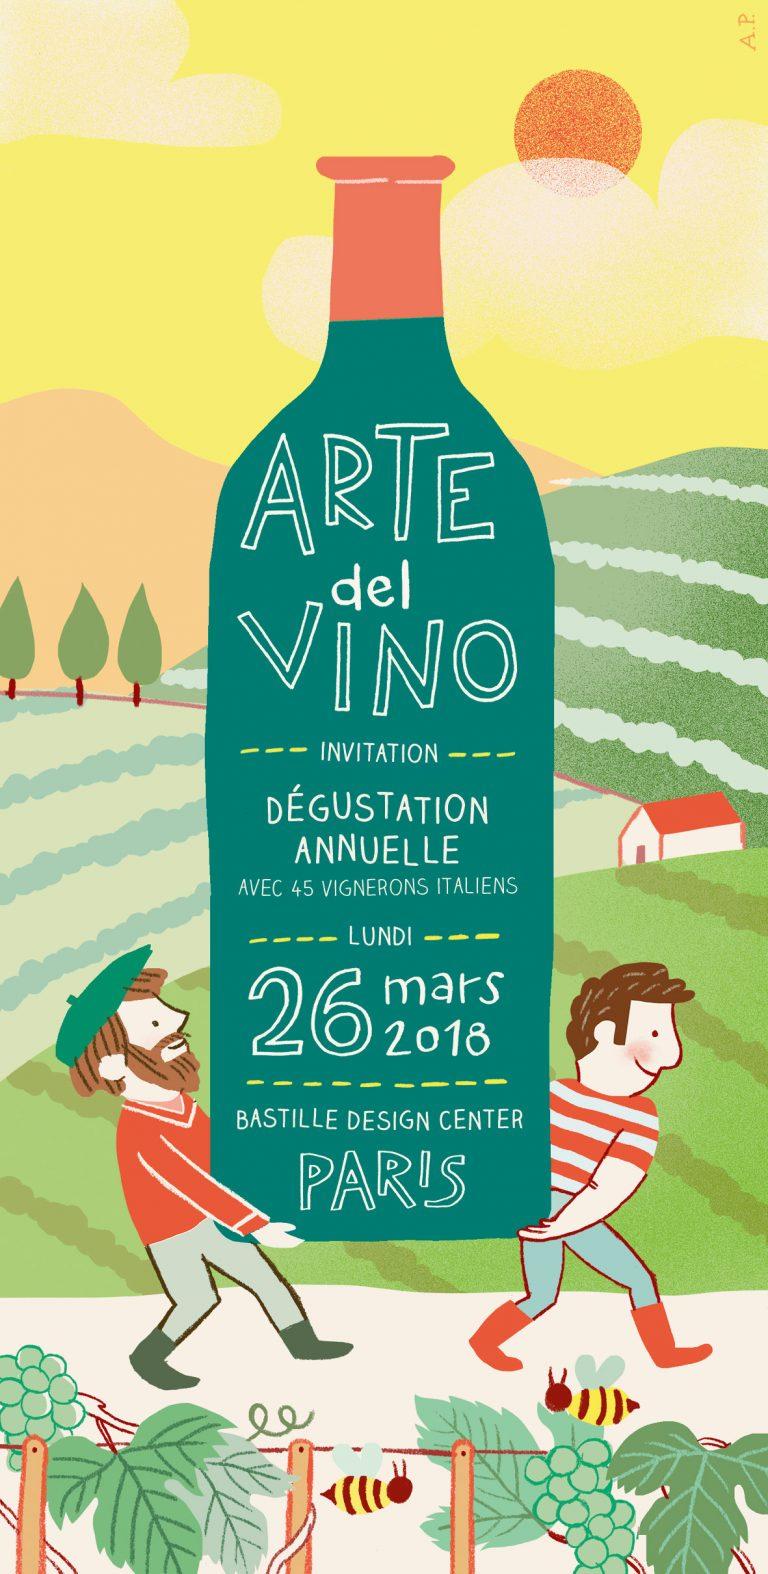 Annalisa Papagna illustration - Arte del vino lettering